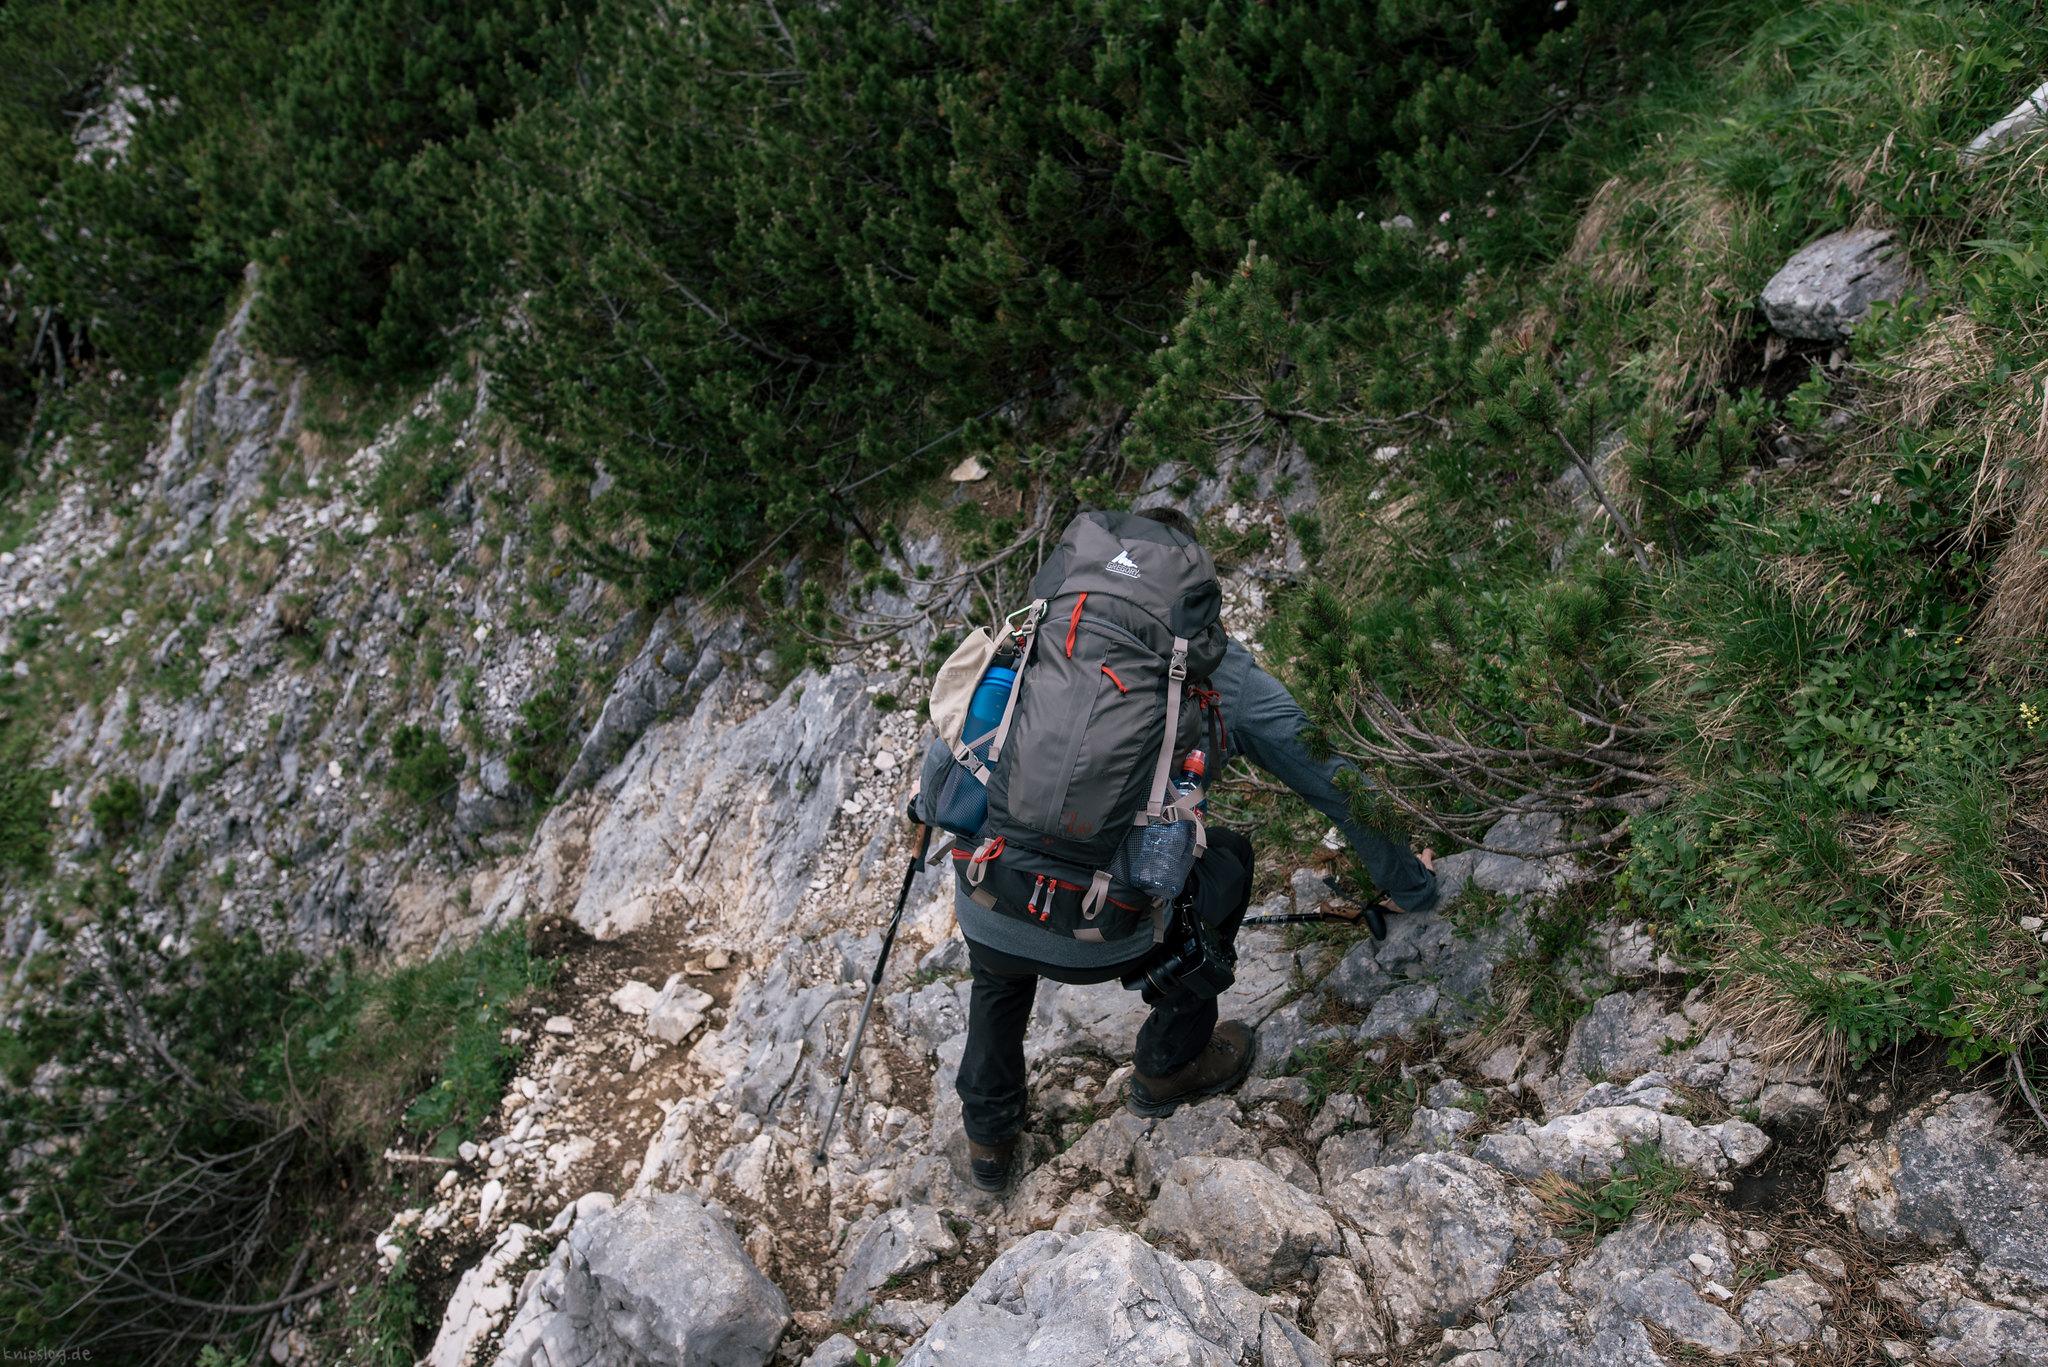 Steep gradient climb